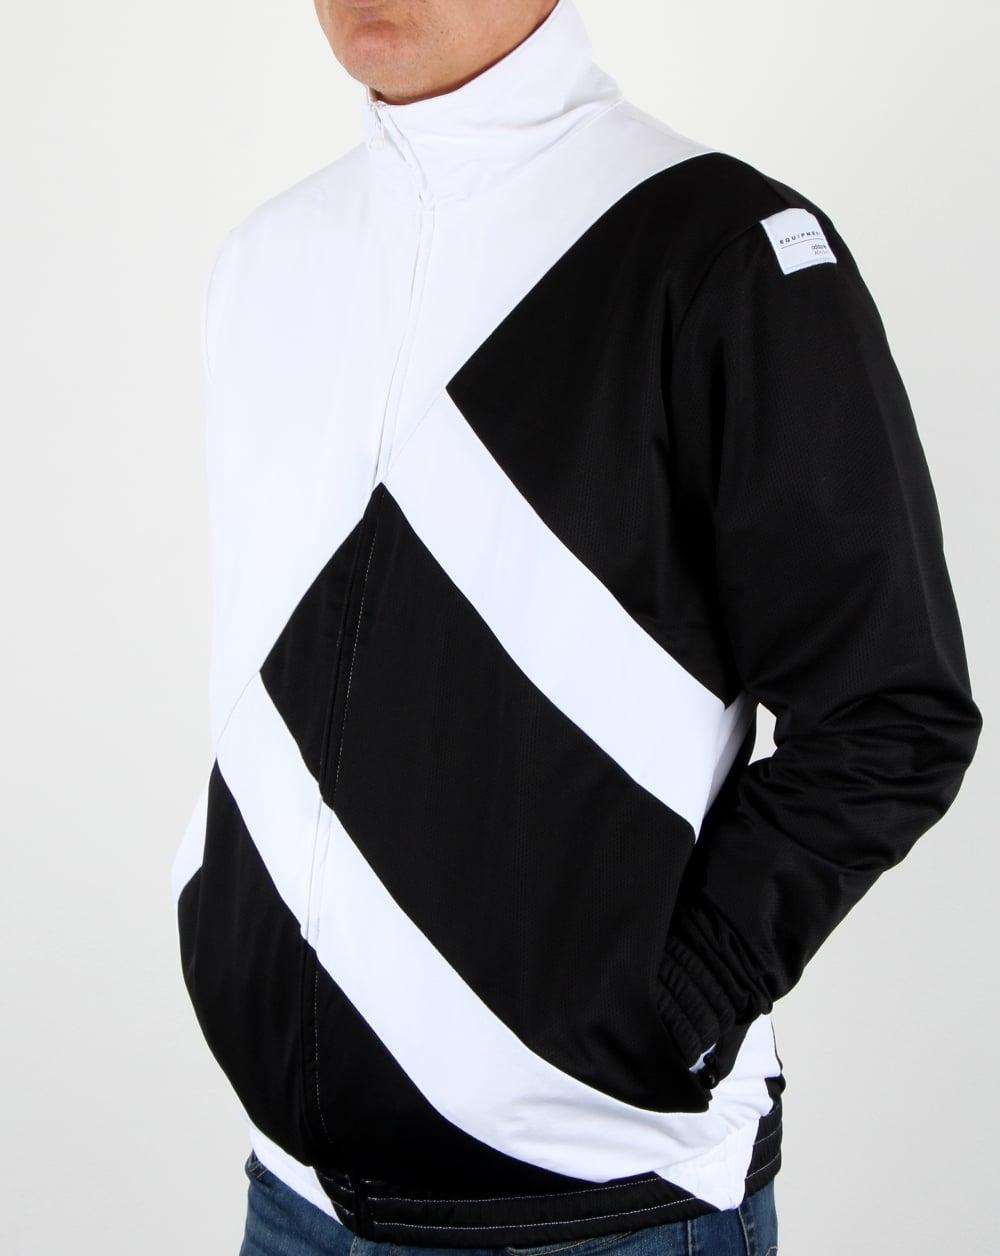 Adidas Originali Eqt Audace Track Top Bianco / Nero, Uomini, Giacca